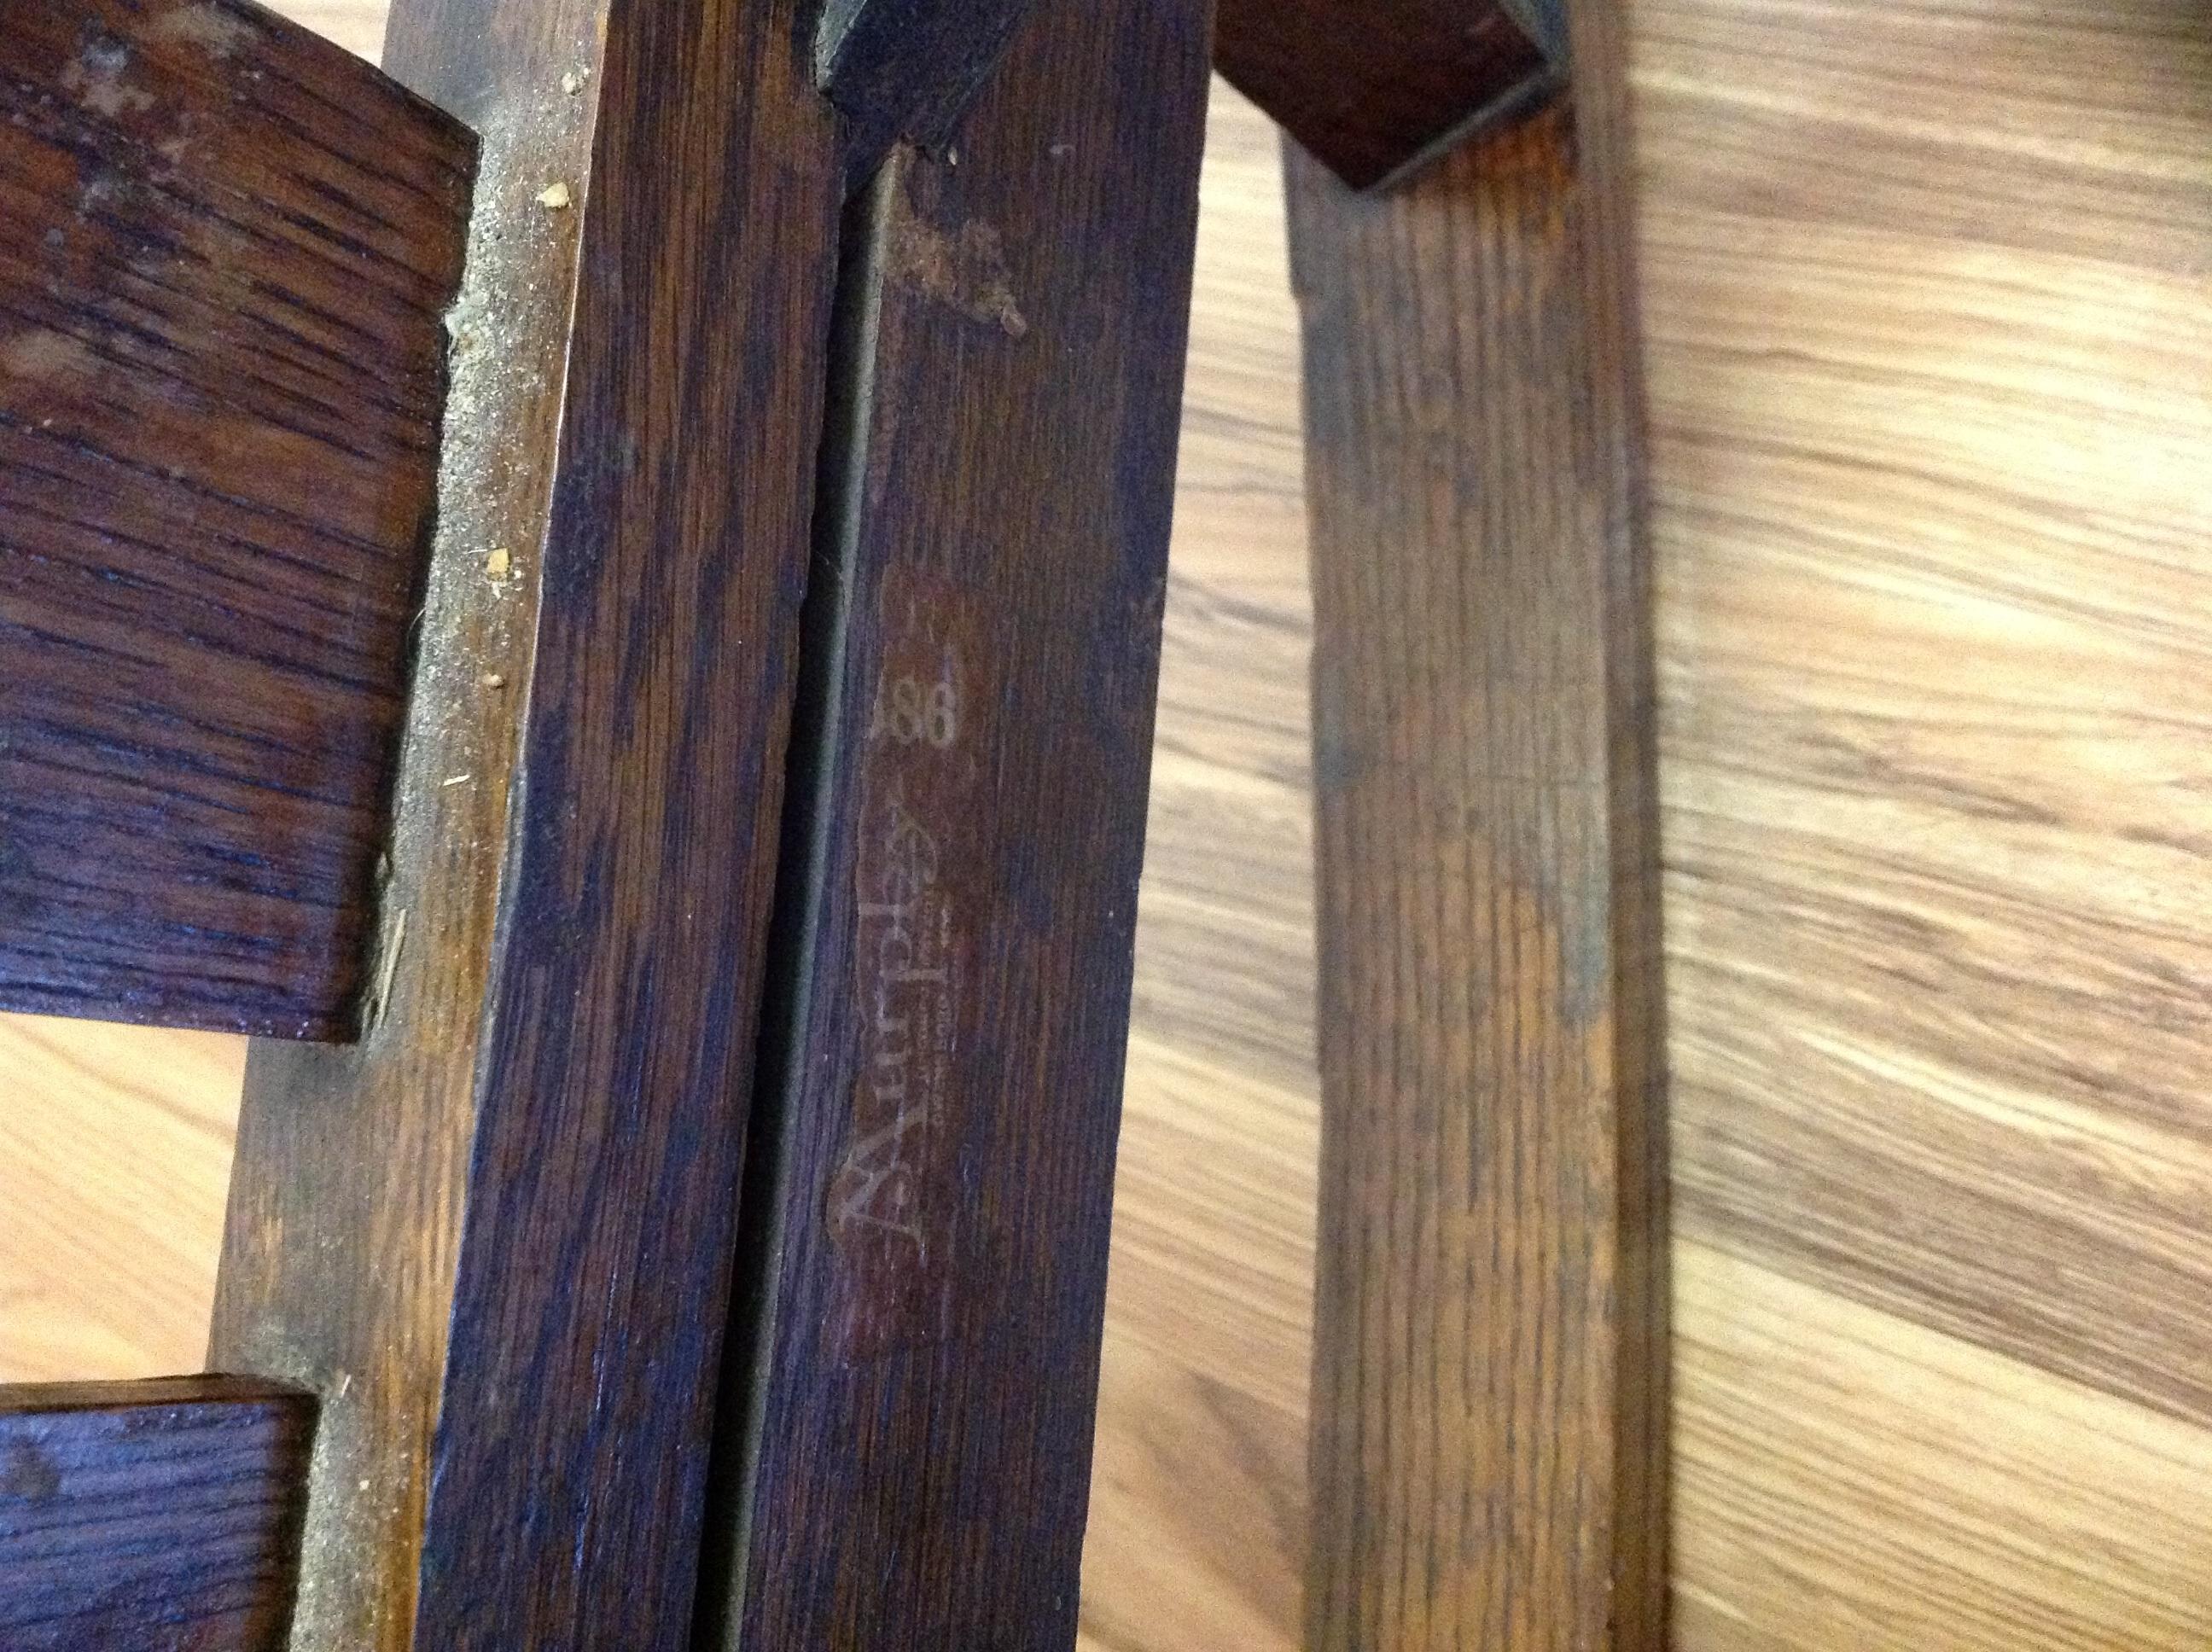 Murphy Chair pany Owensboro KY antique appraisal